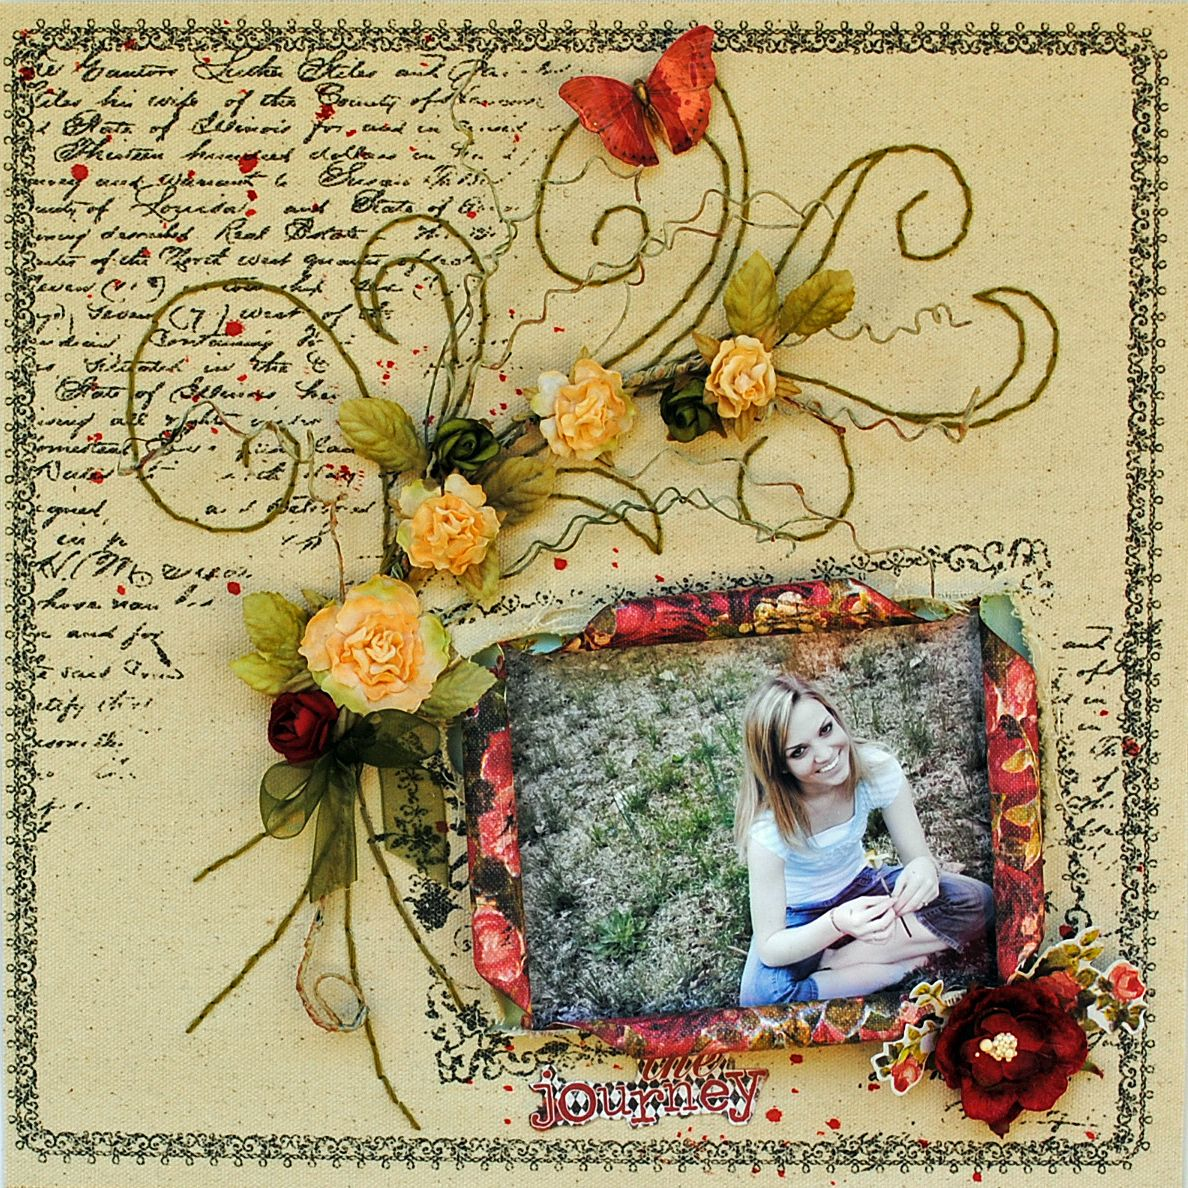 Journey scrapbook ideas - Create This Flower Scrapbook Layout With This Essentials Cartridge